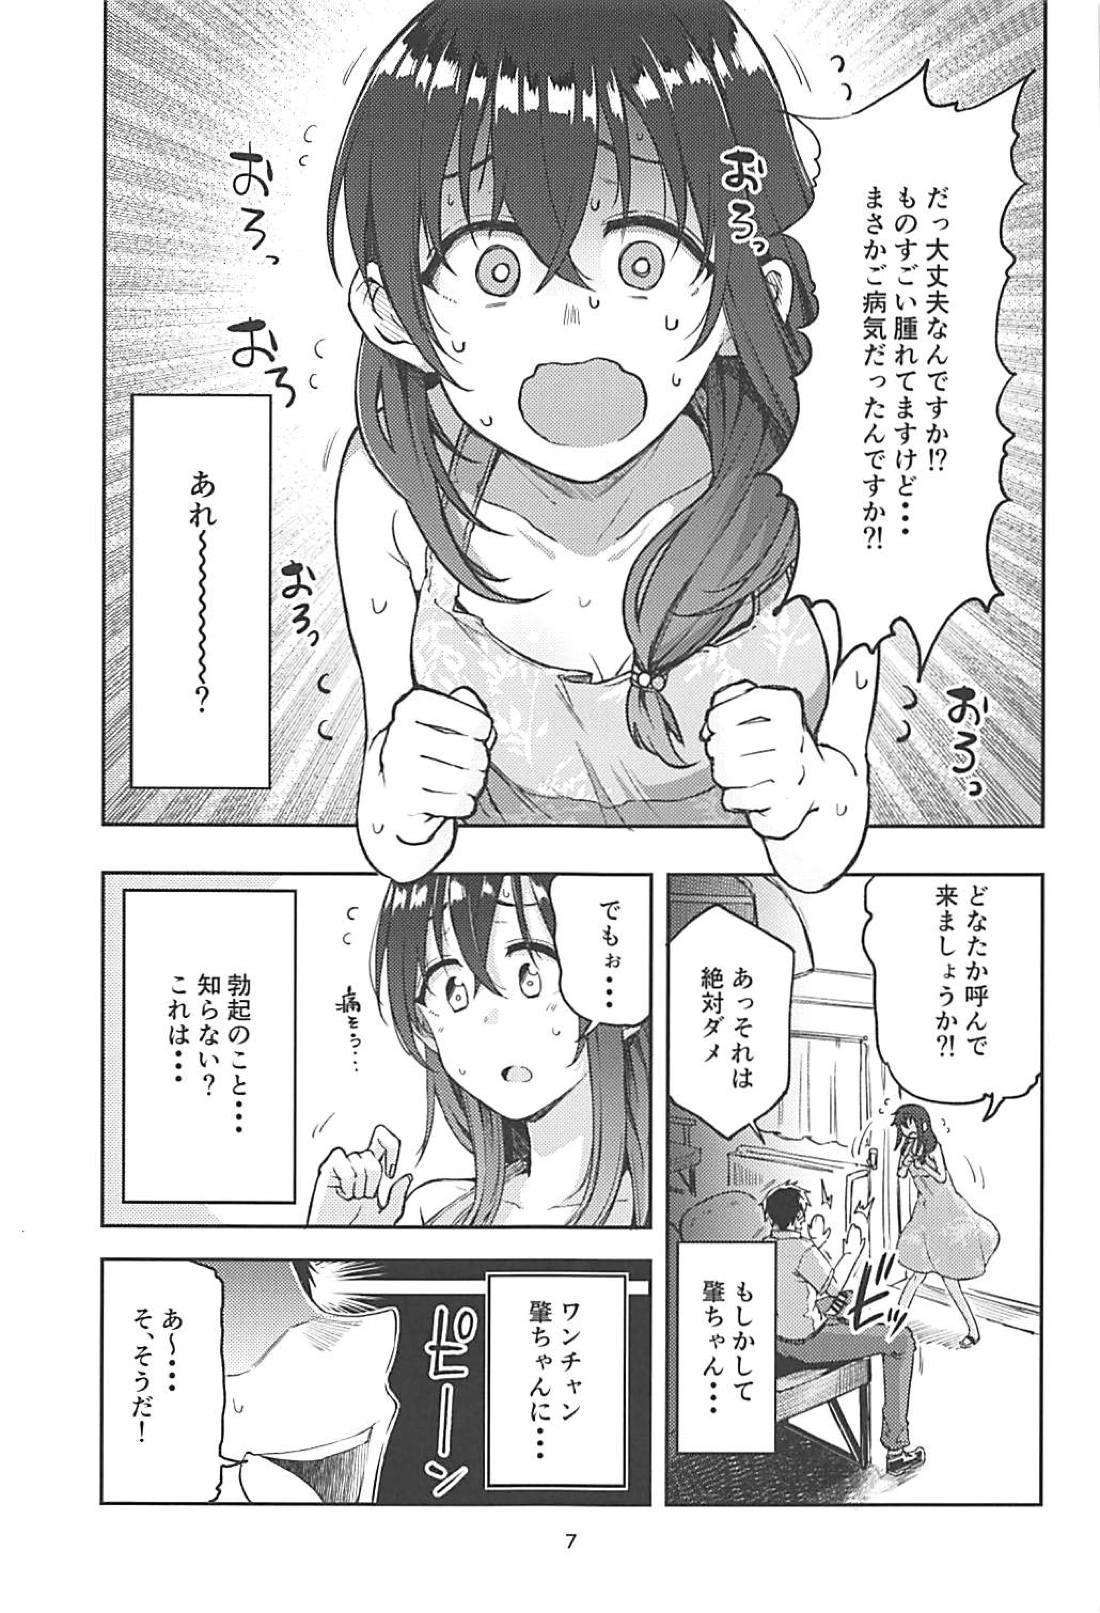 Hajime-chan to Itoshiisaa 4